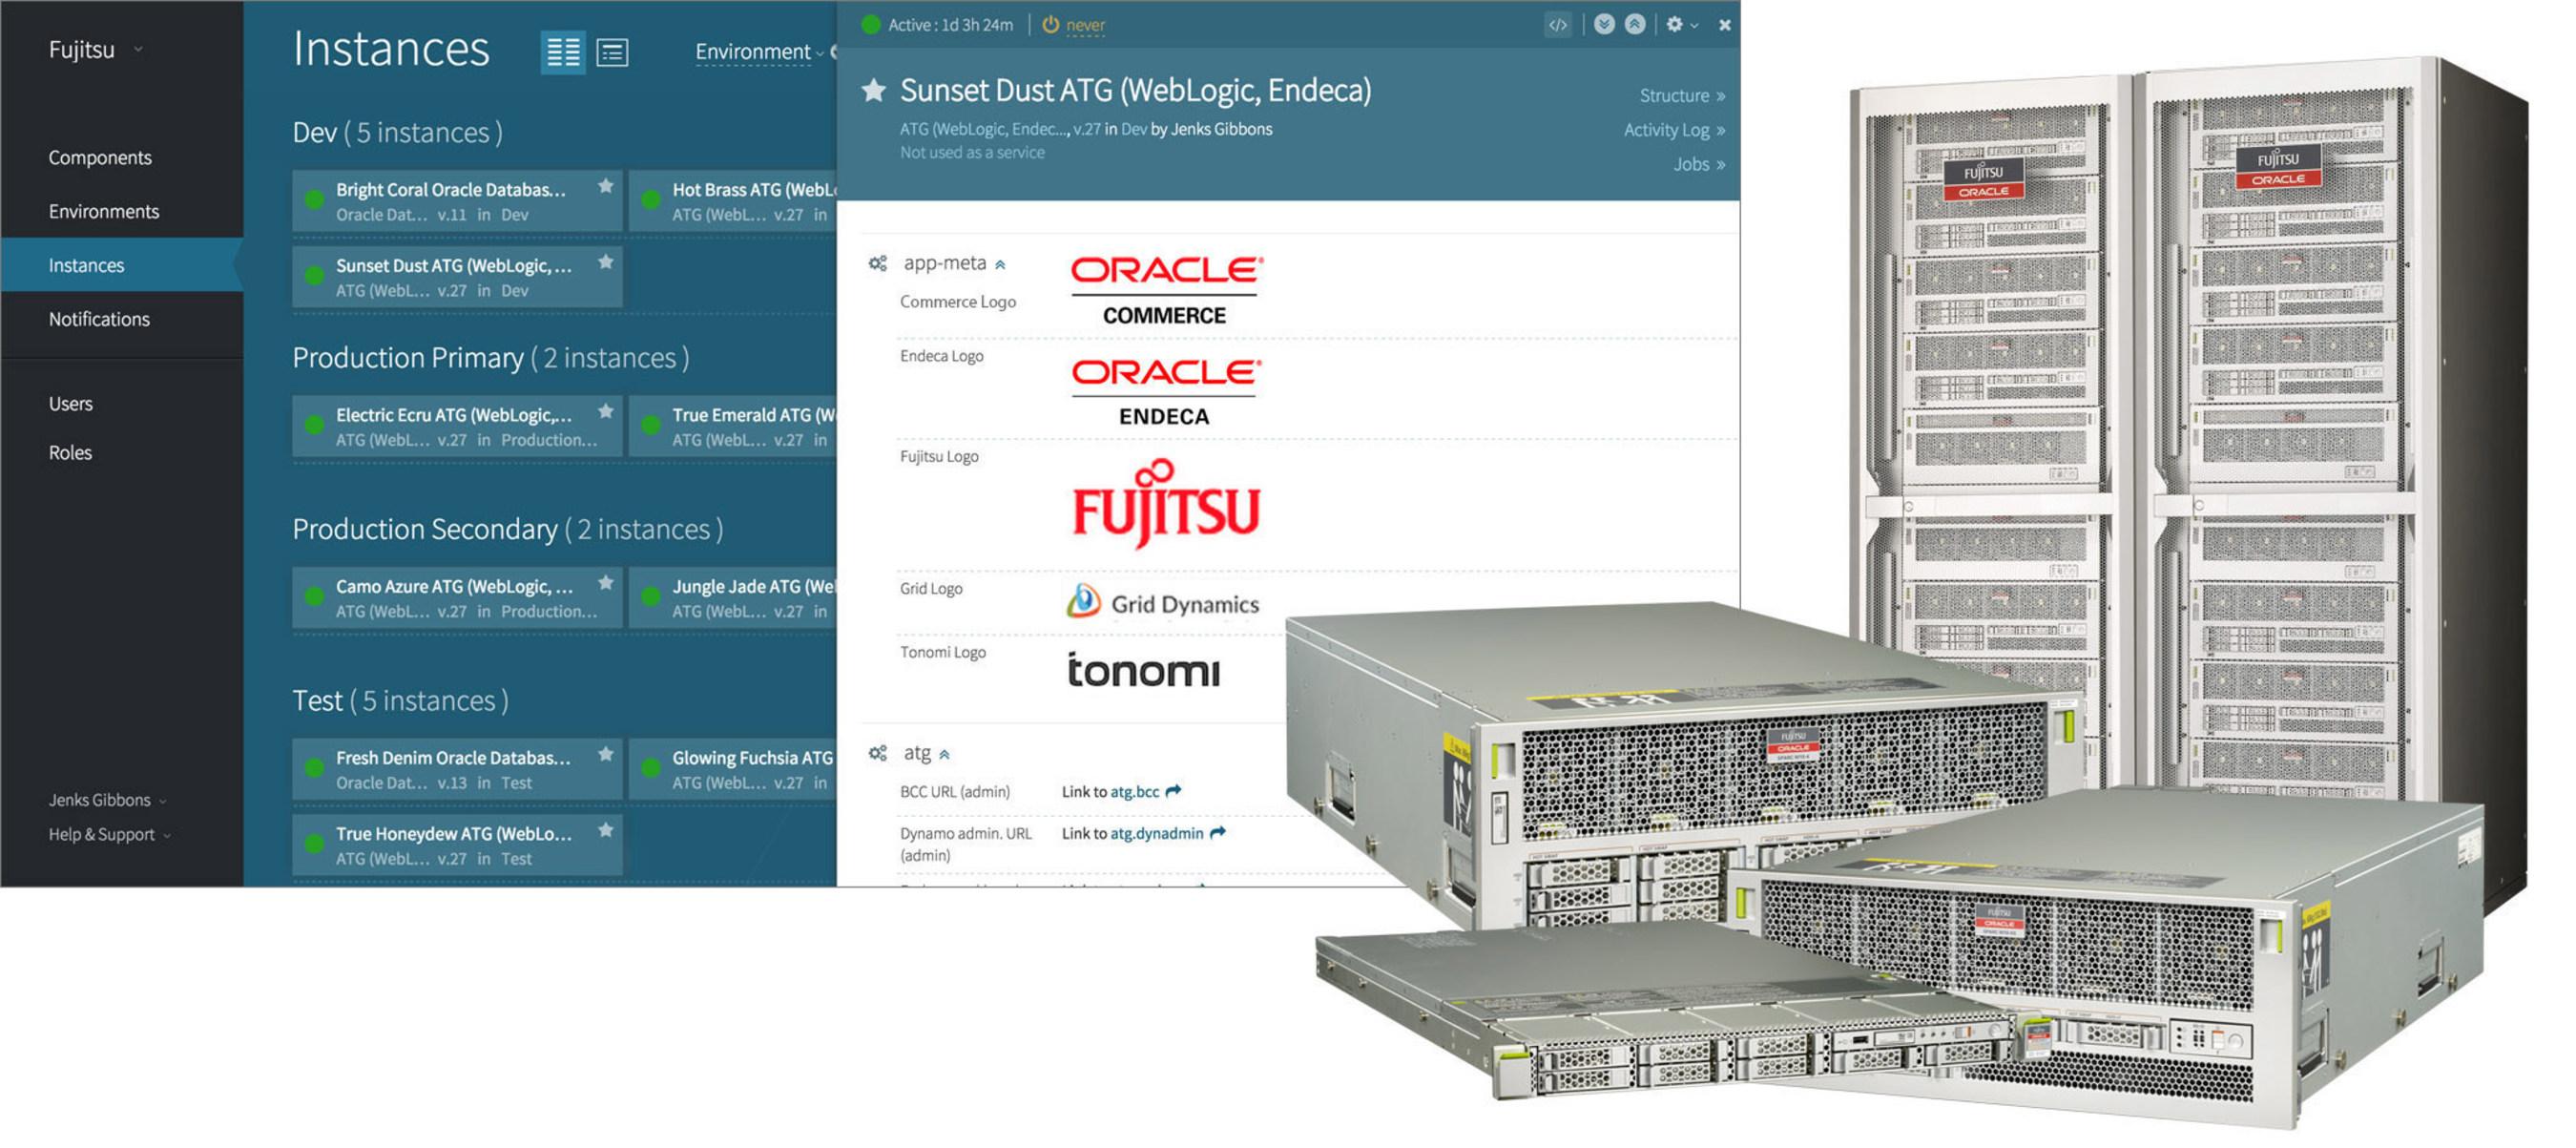 Grid Dynamics and Fujitsu Deliver Oracle Commerce Platform on Fujitsu M10 Servers as a